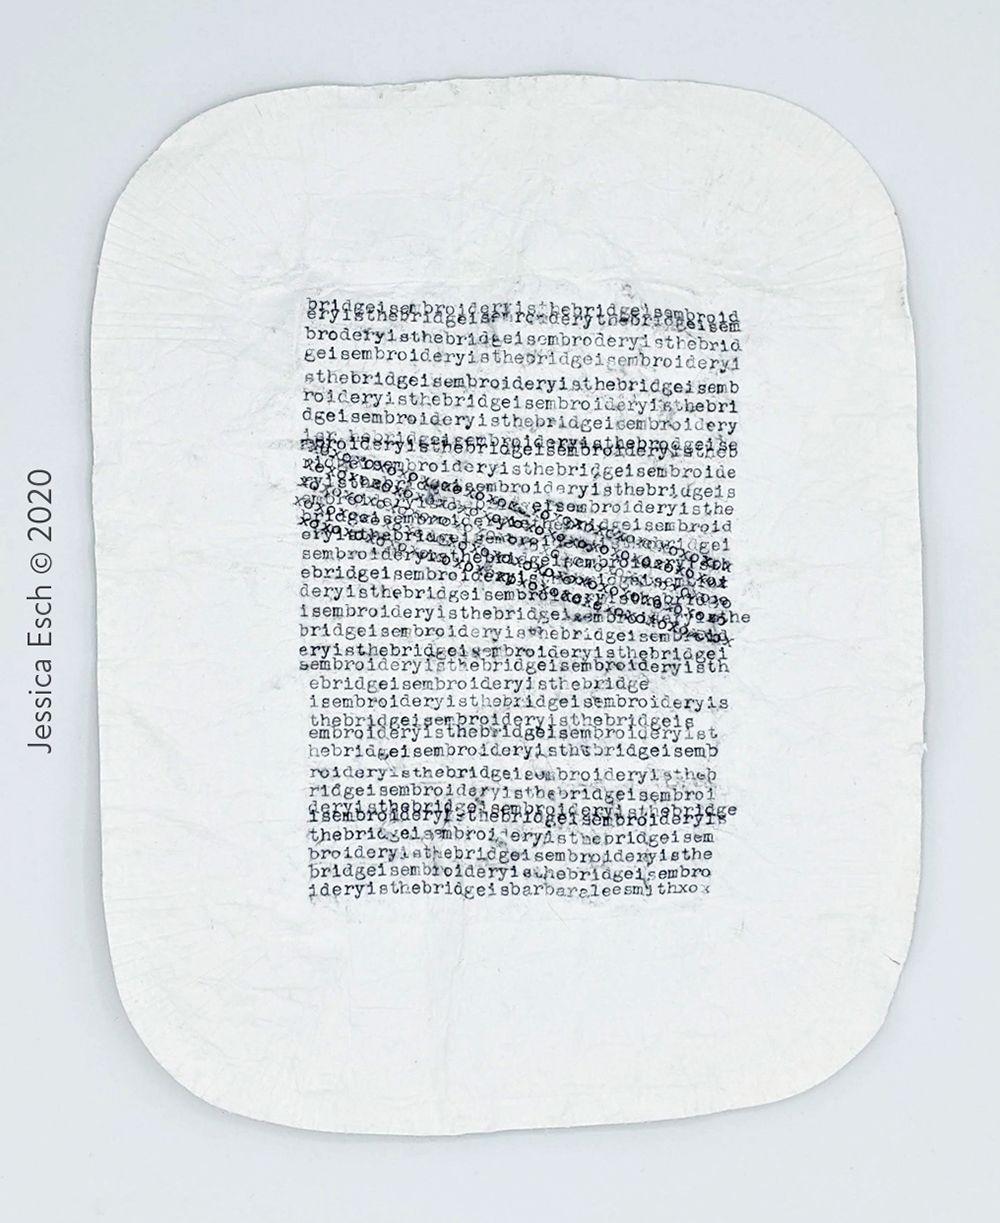 Artwork made with typewritten text